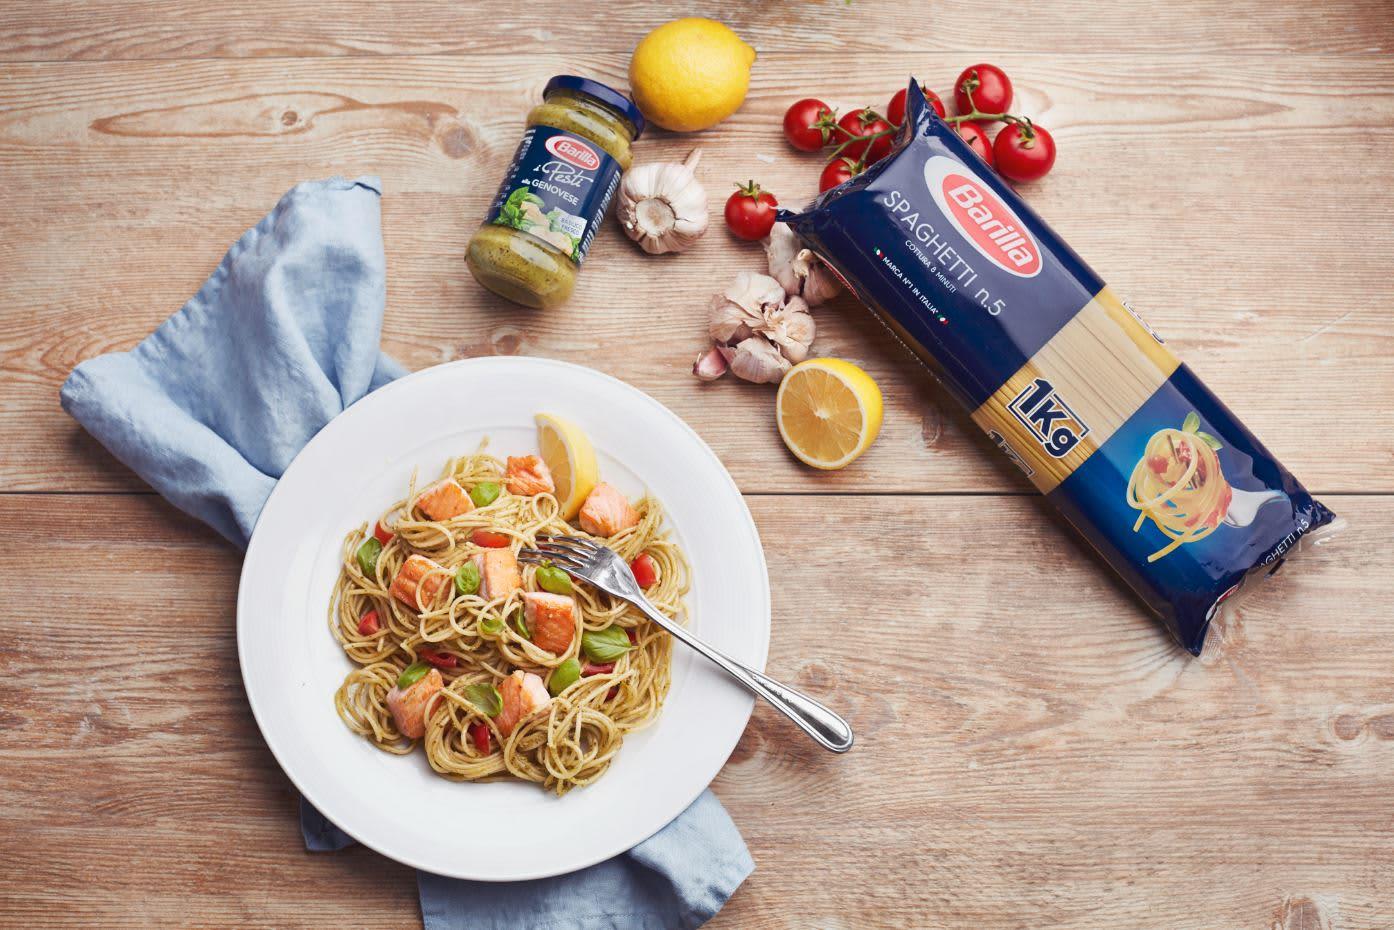 Billig og godt med laks, pesto og spaghetti. Foto: Øyvind Haug